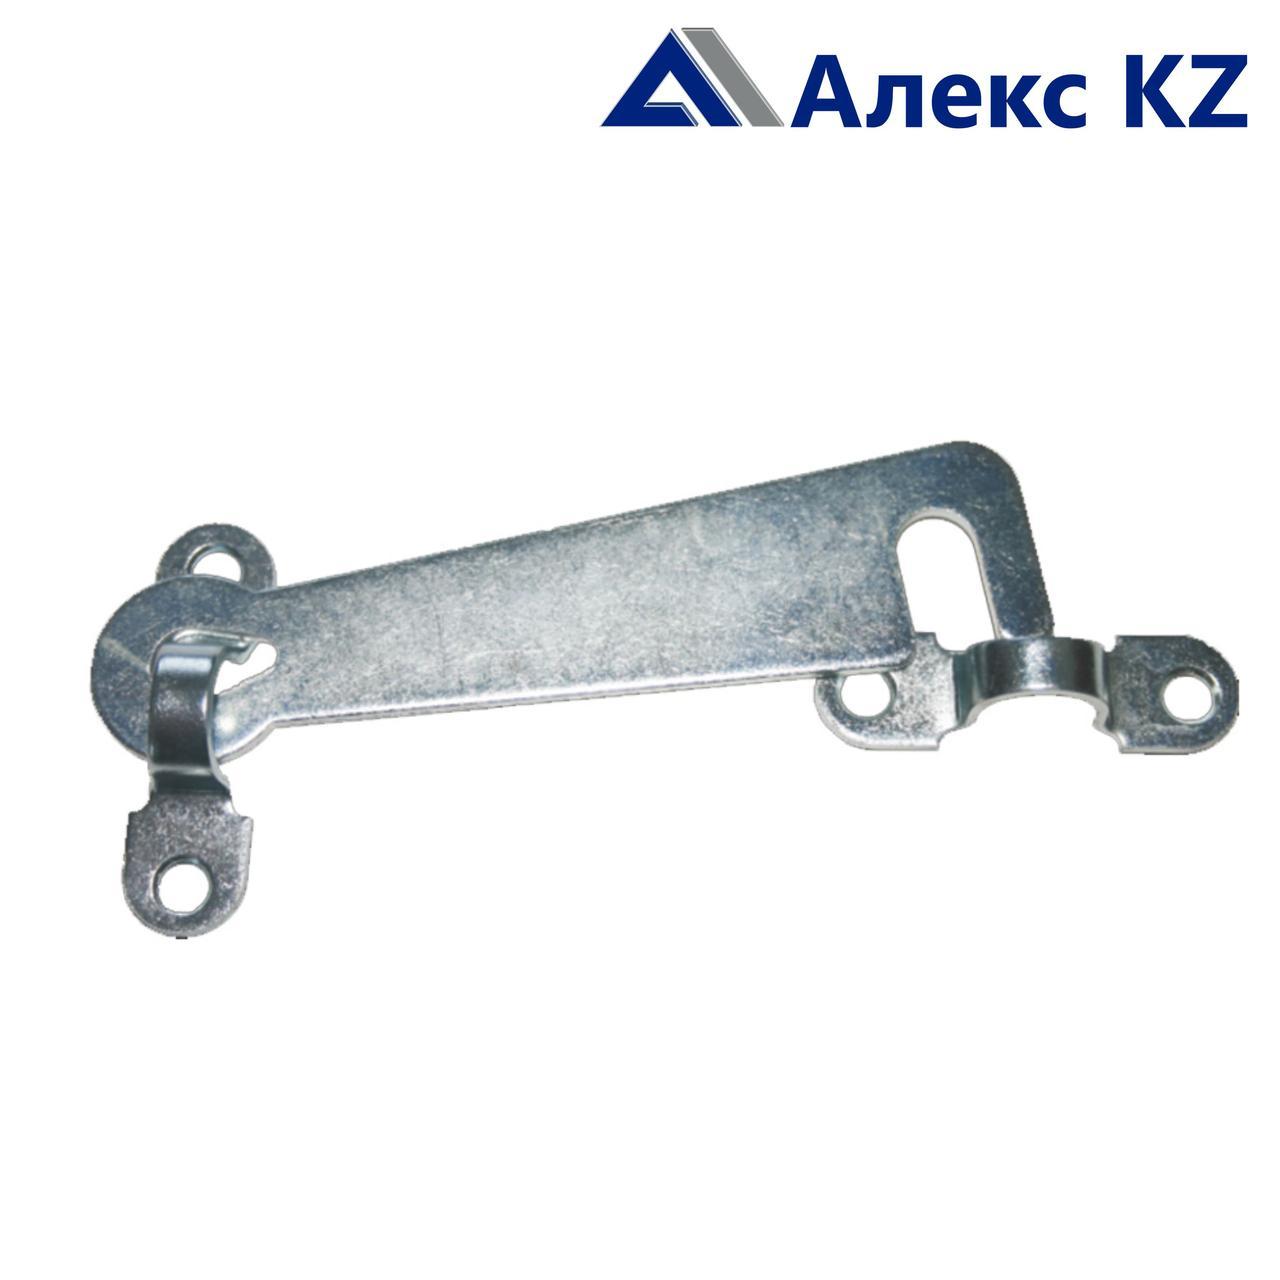 Крючок дверной КД-75 цинк